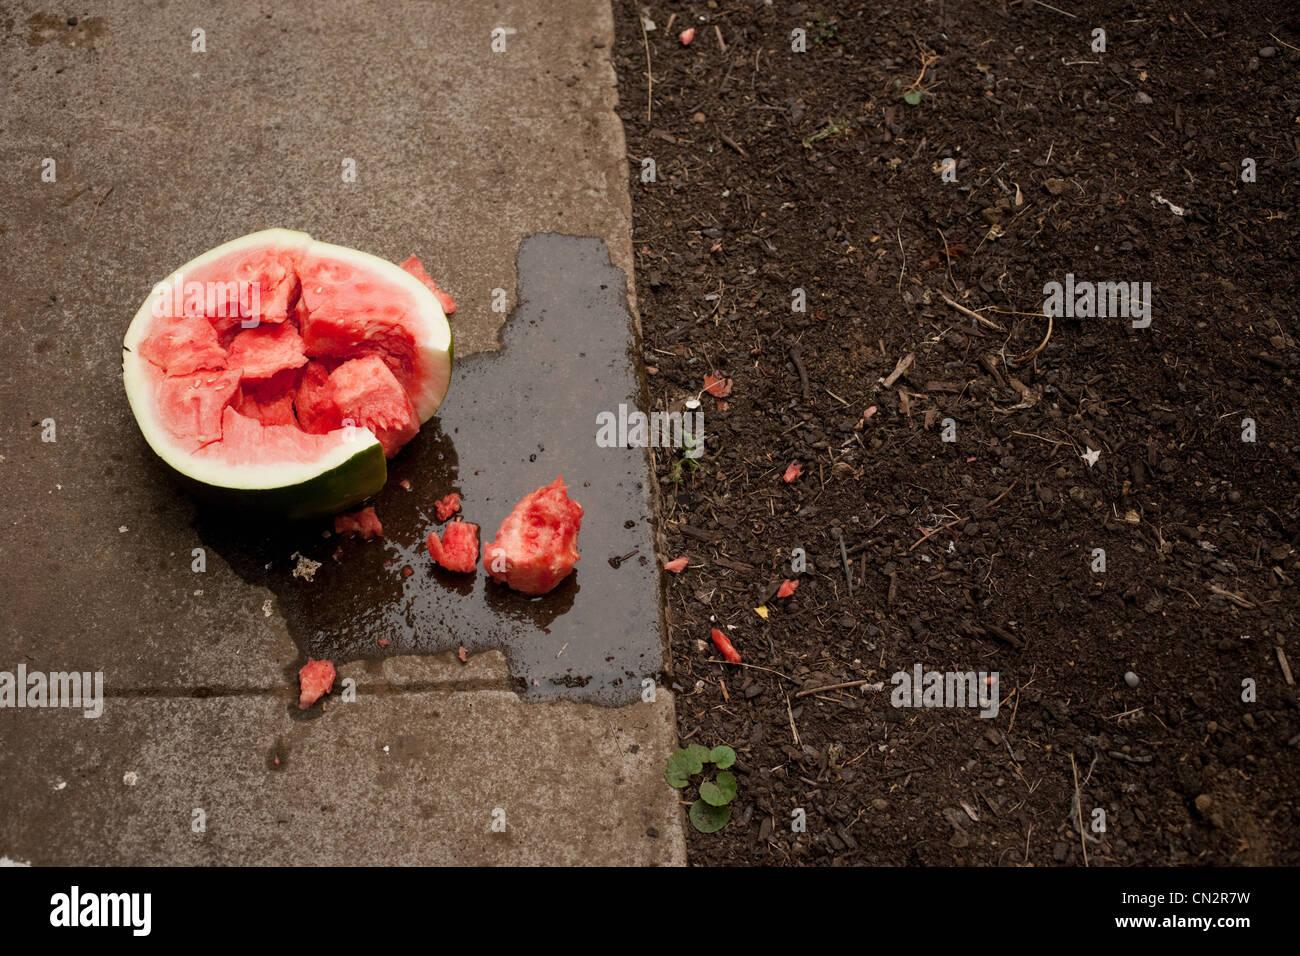 Broken watermelon on sidewalk - Stock Image